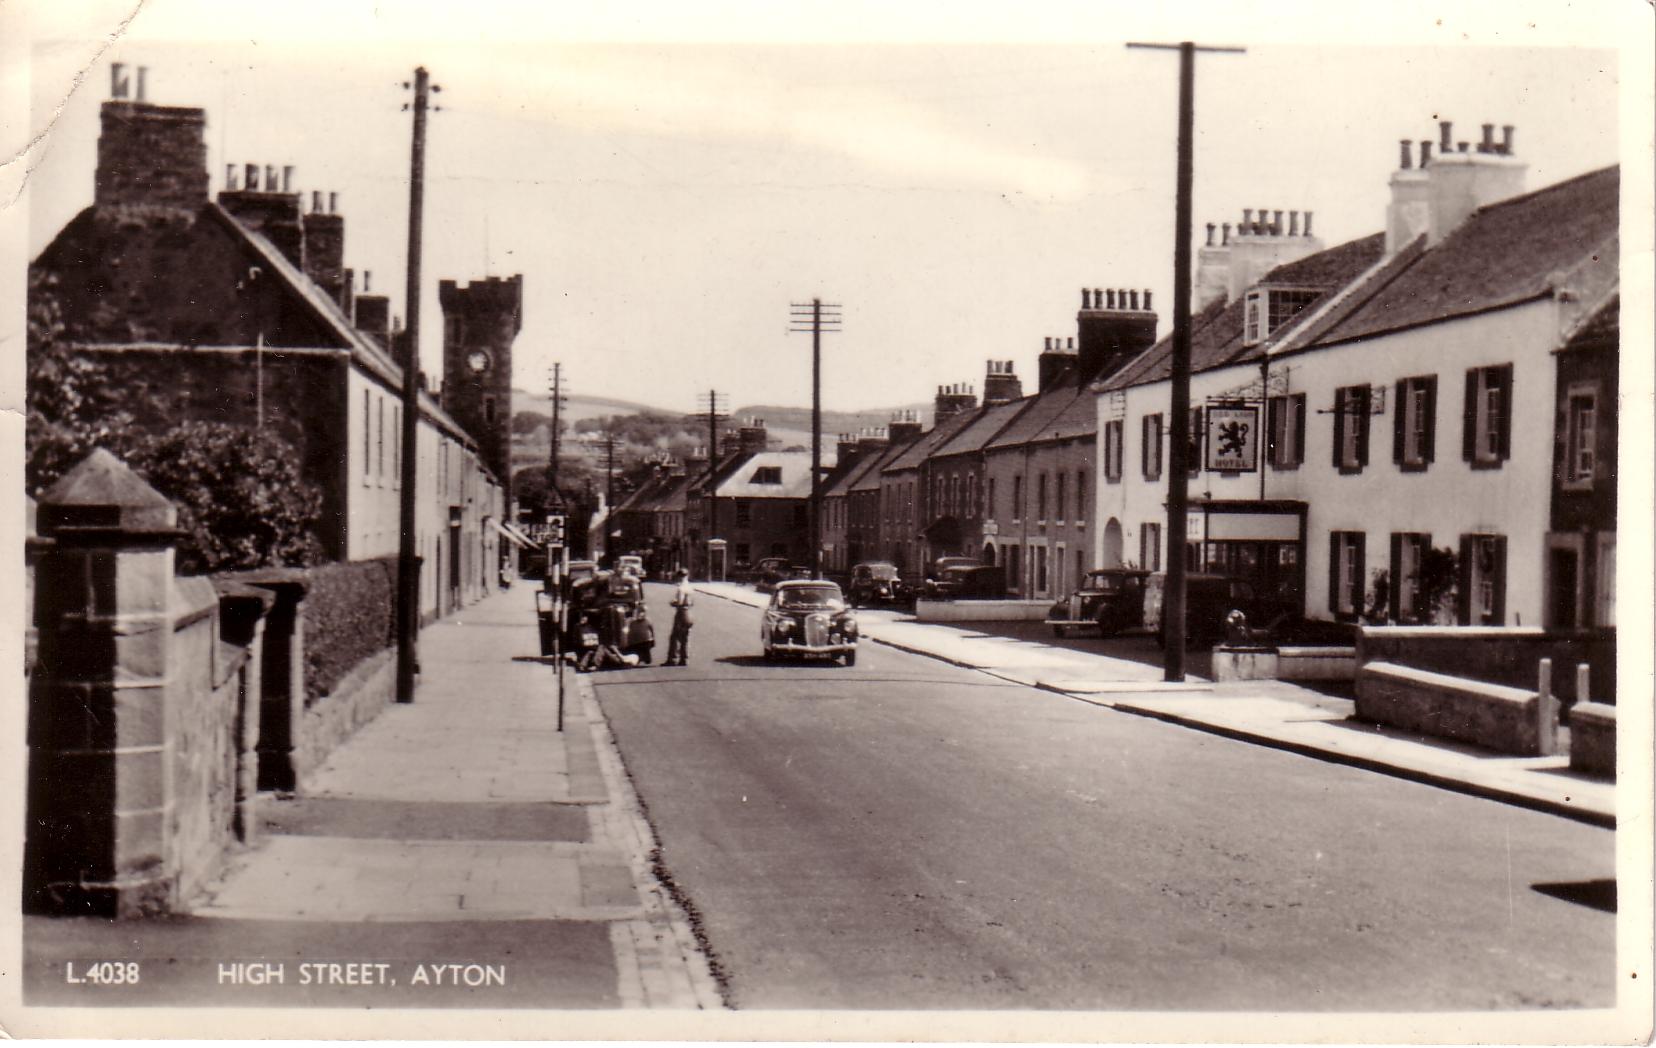 High Street Ayton